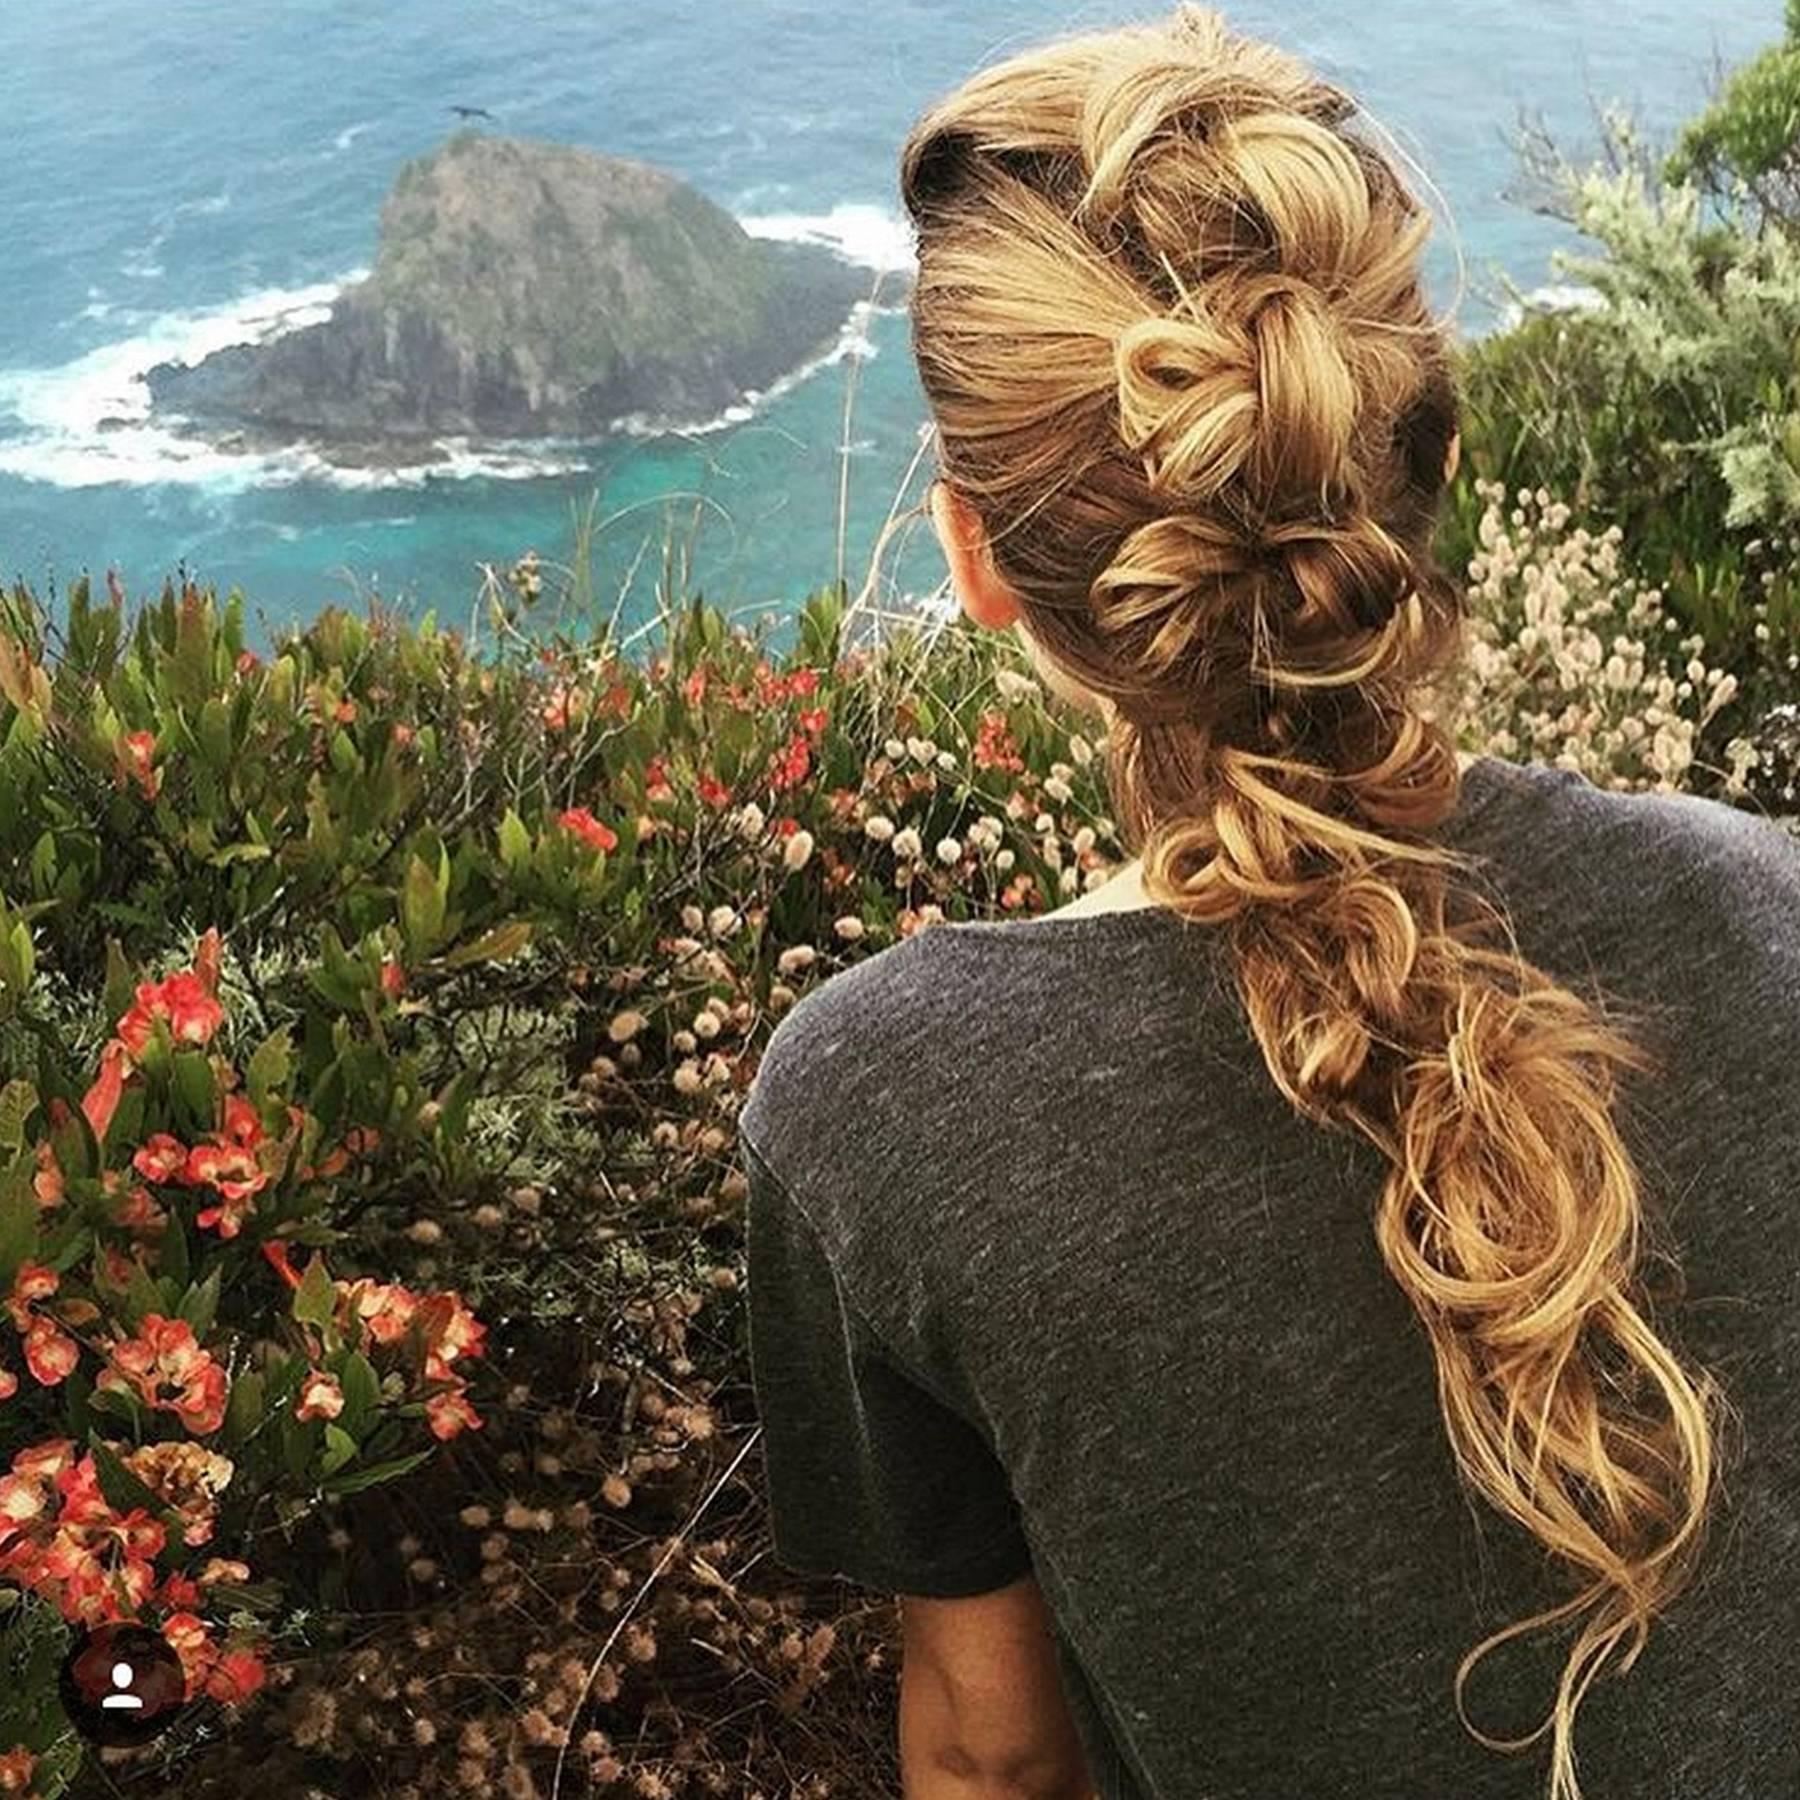 celebrity plaits 2016 - creative braids re-invented & instagram